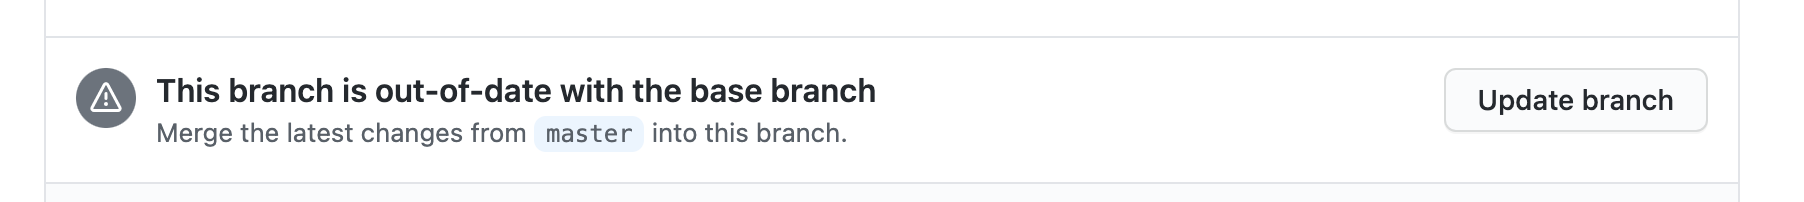 Update branch